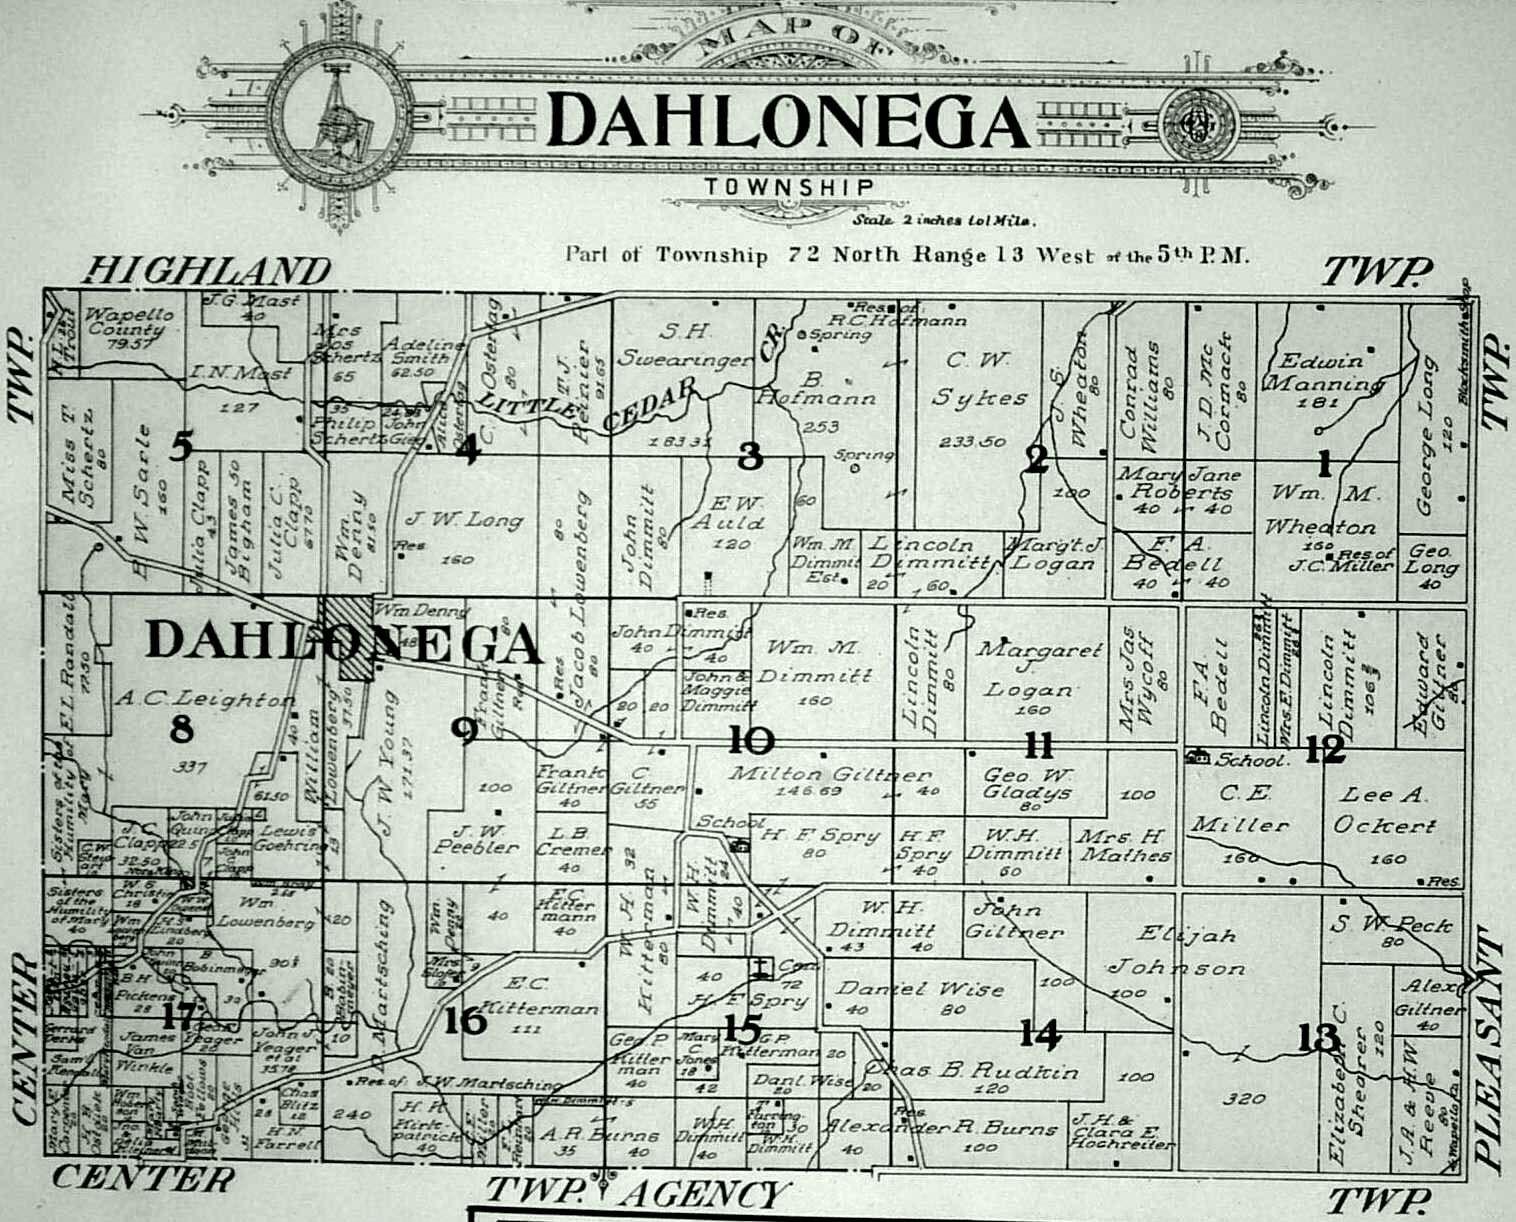 Map Of Dahlonega Georgia Dahlonega Pinterest Dahlonega - Georgia map dahlonega